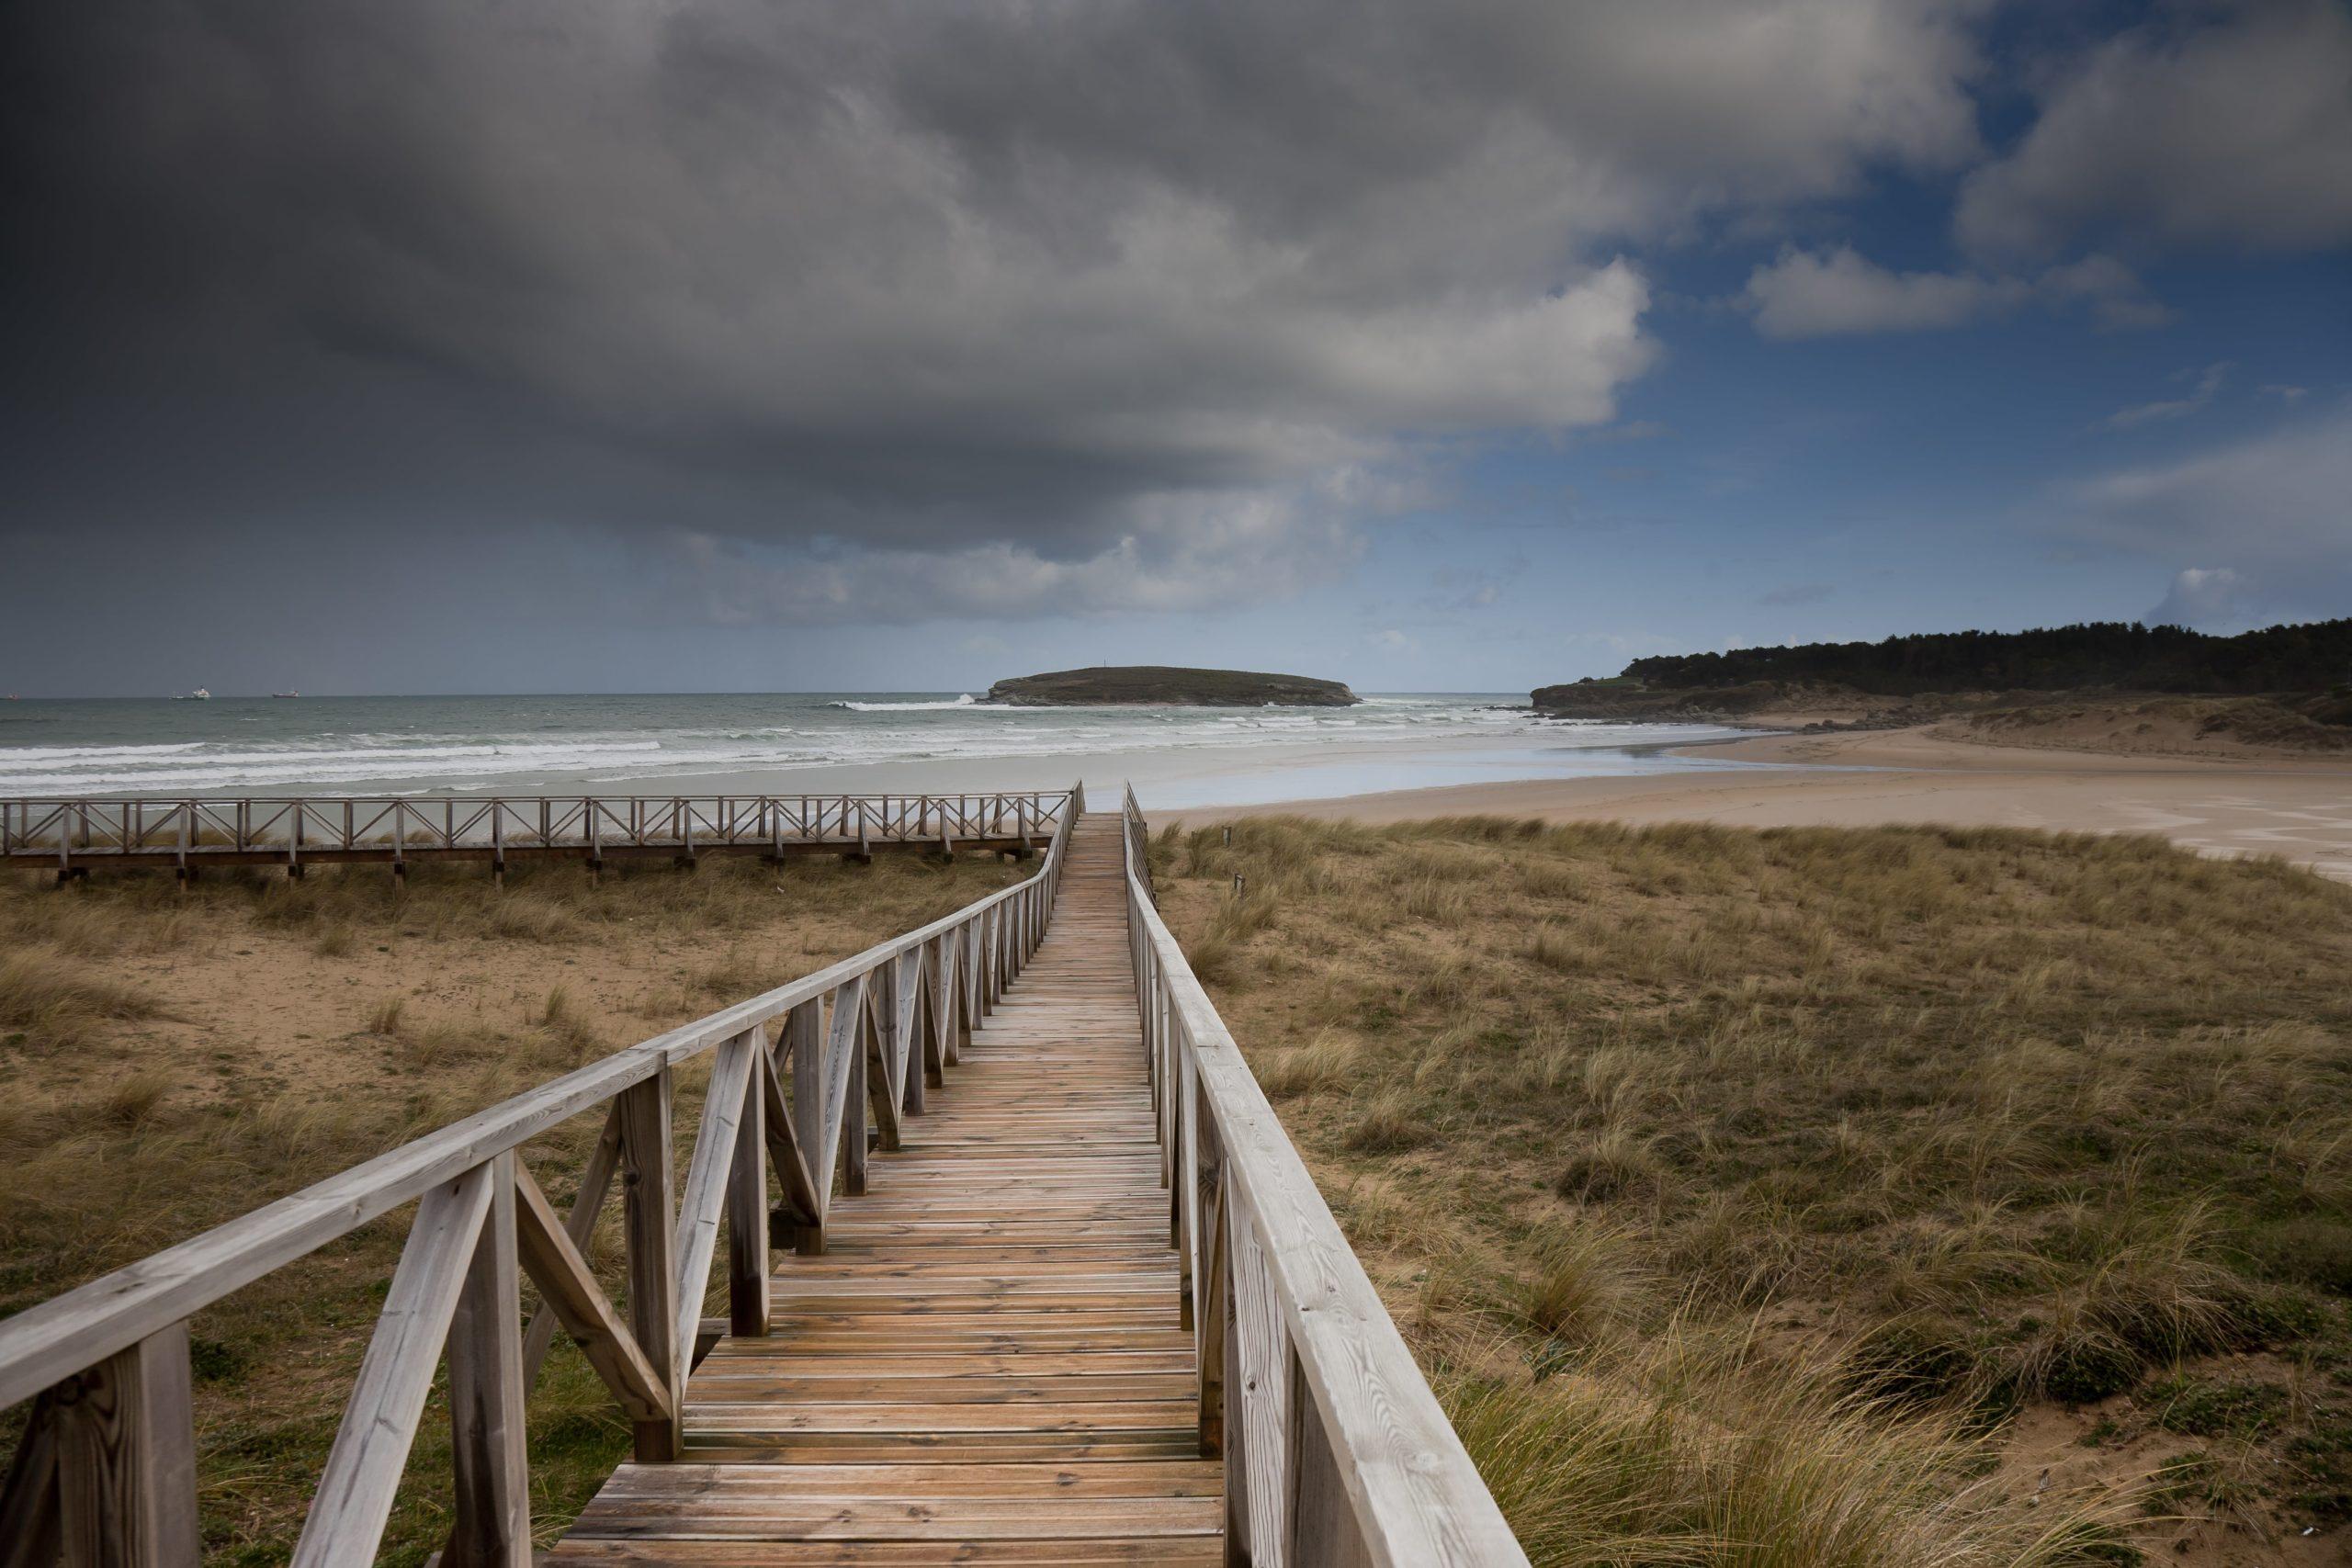 Loredo Cantabria Surf Town in Spain